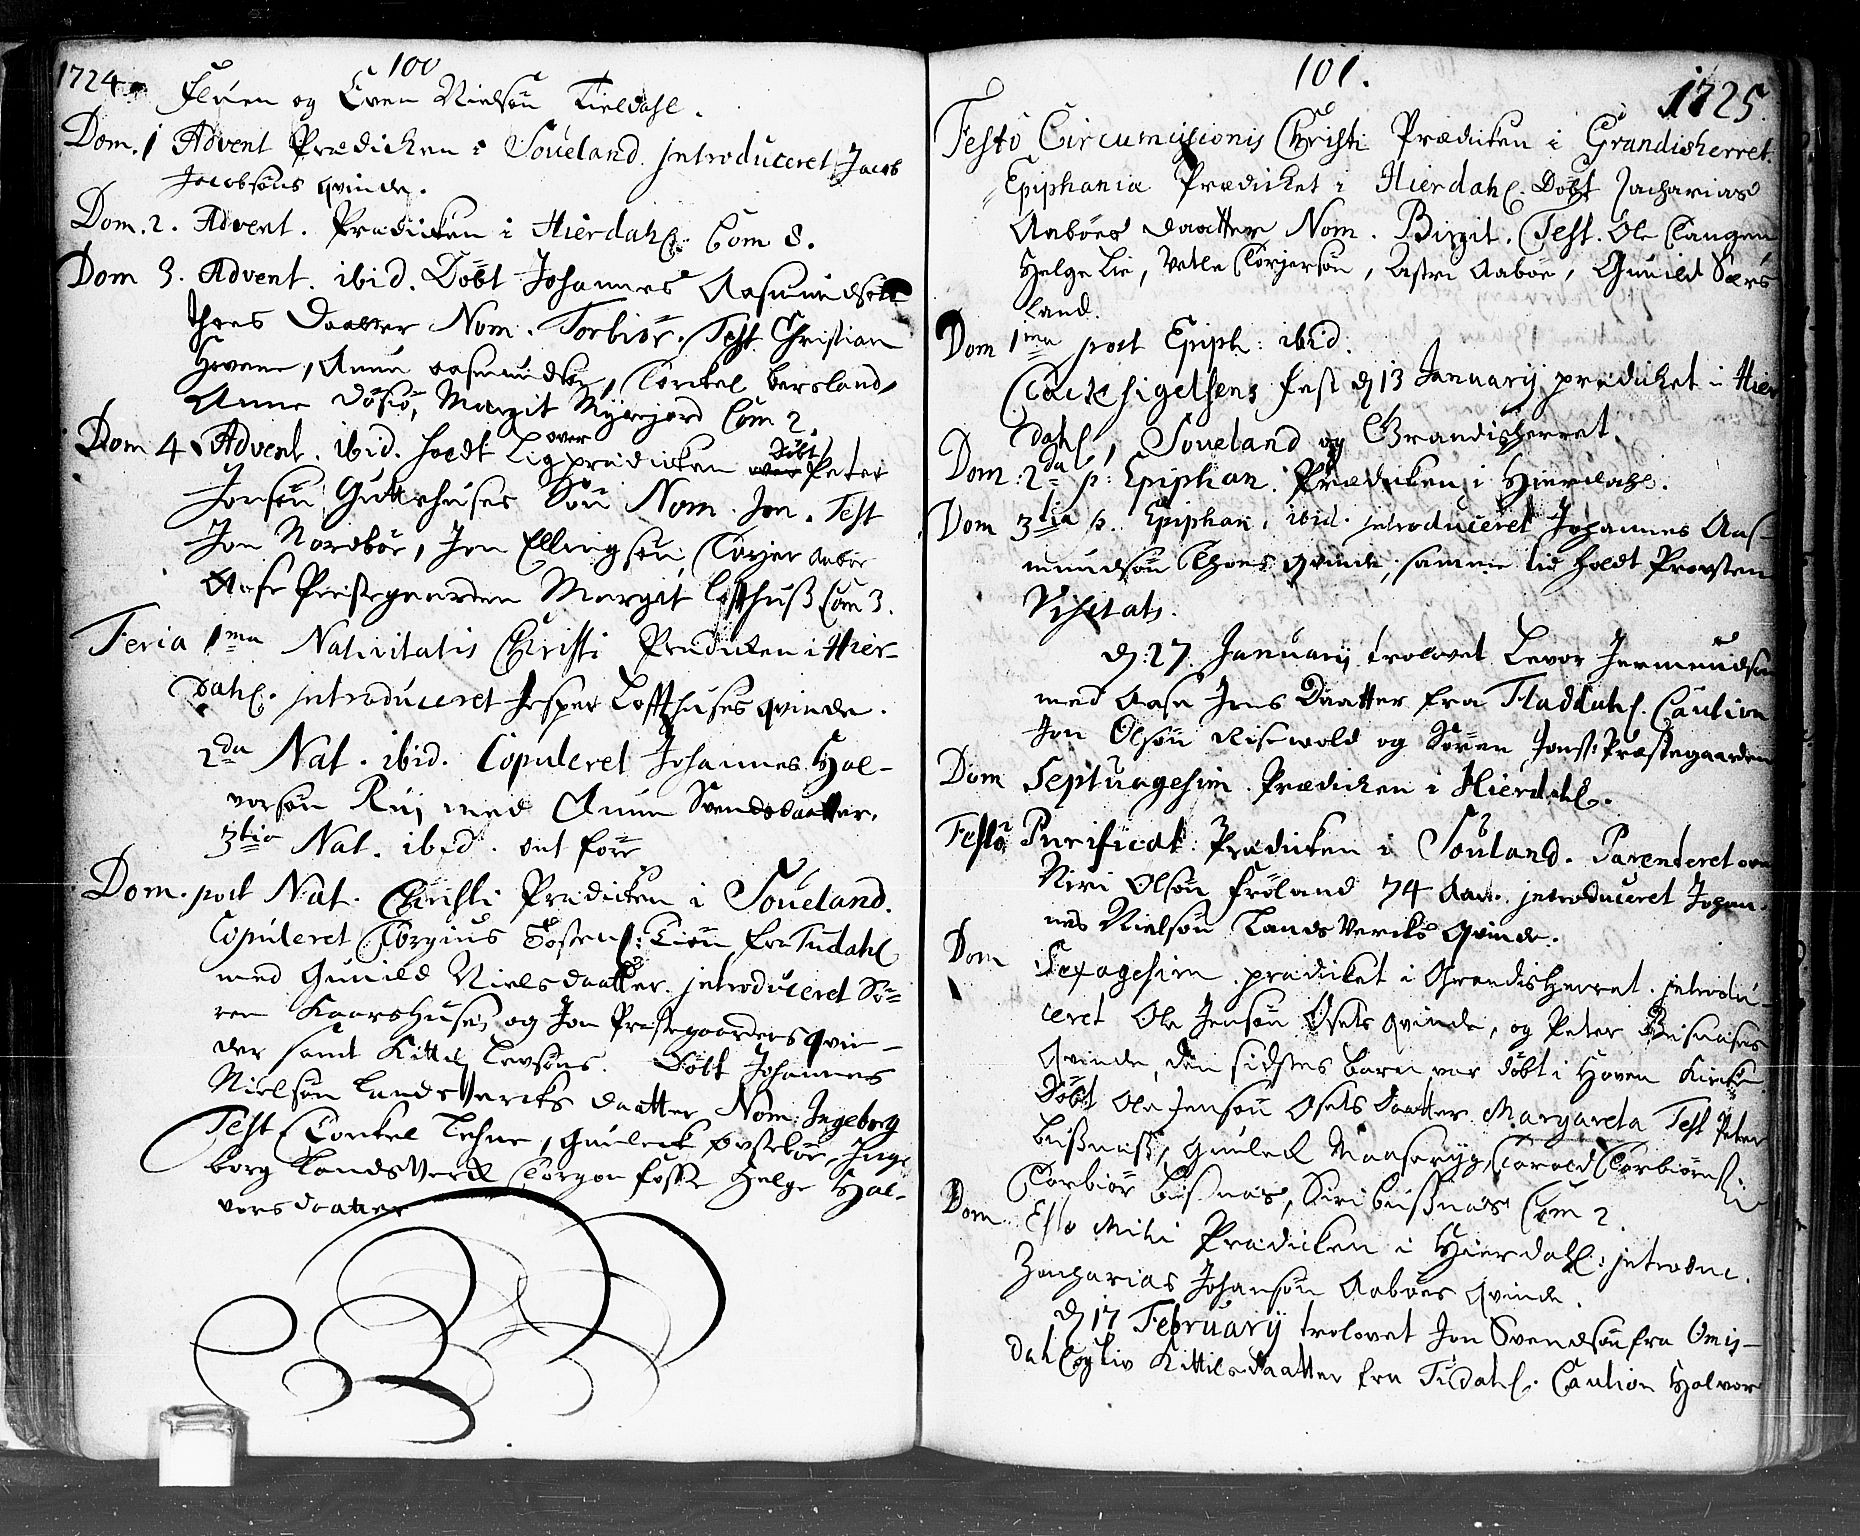 SAKO, Hjartdal kirkebøker, F/Fa/L0002: Ministerialbok nr. I 2, 1716-1754, s. 100-101